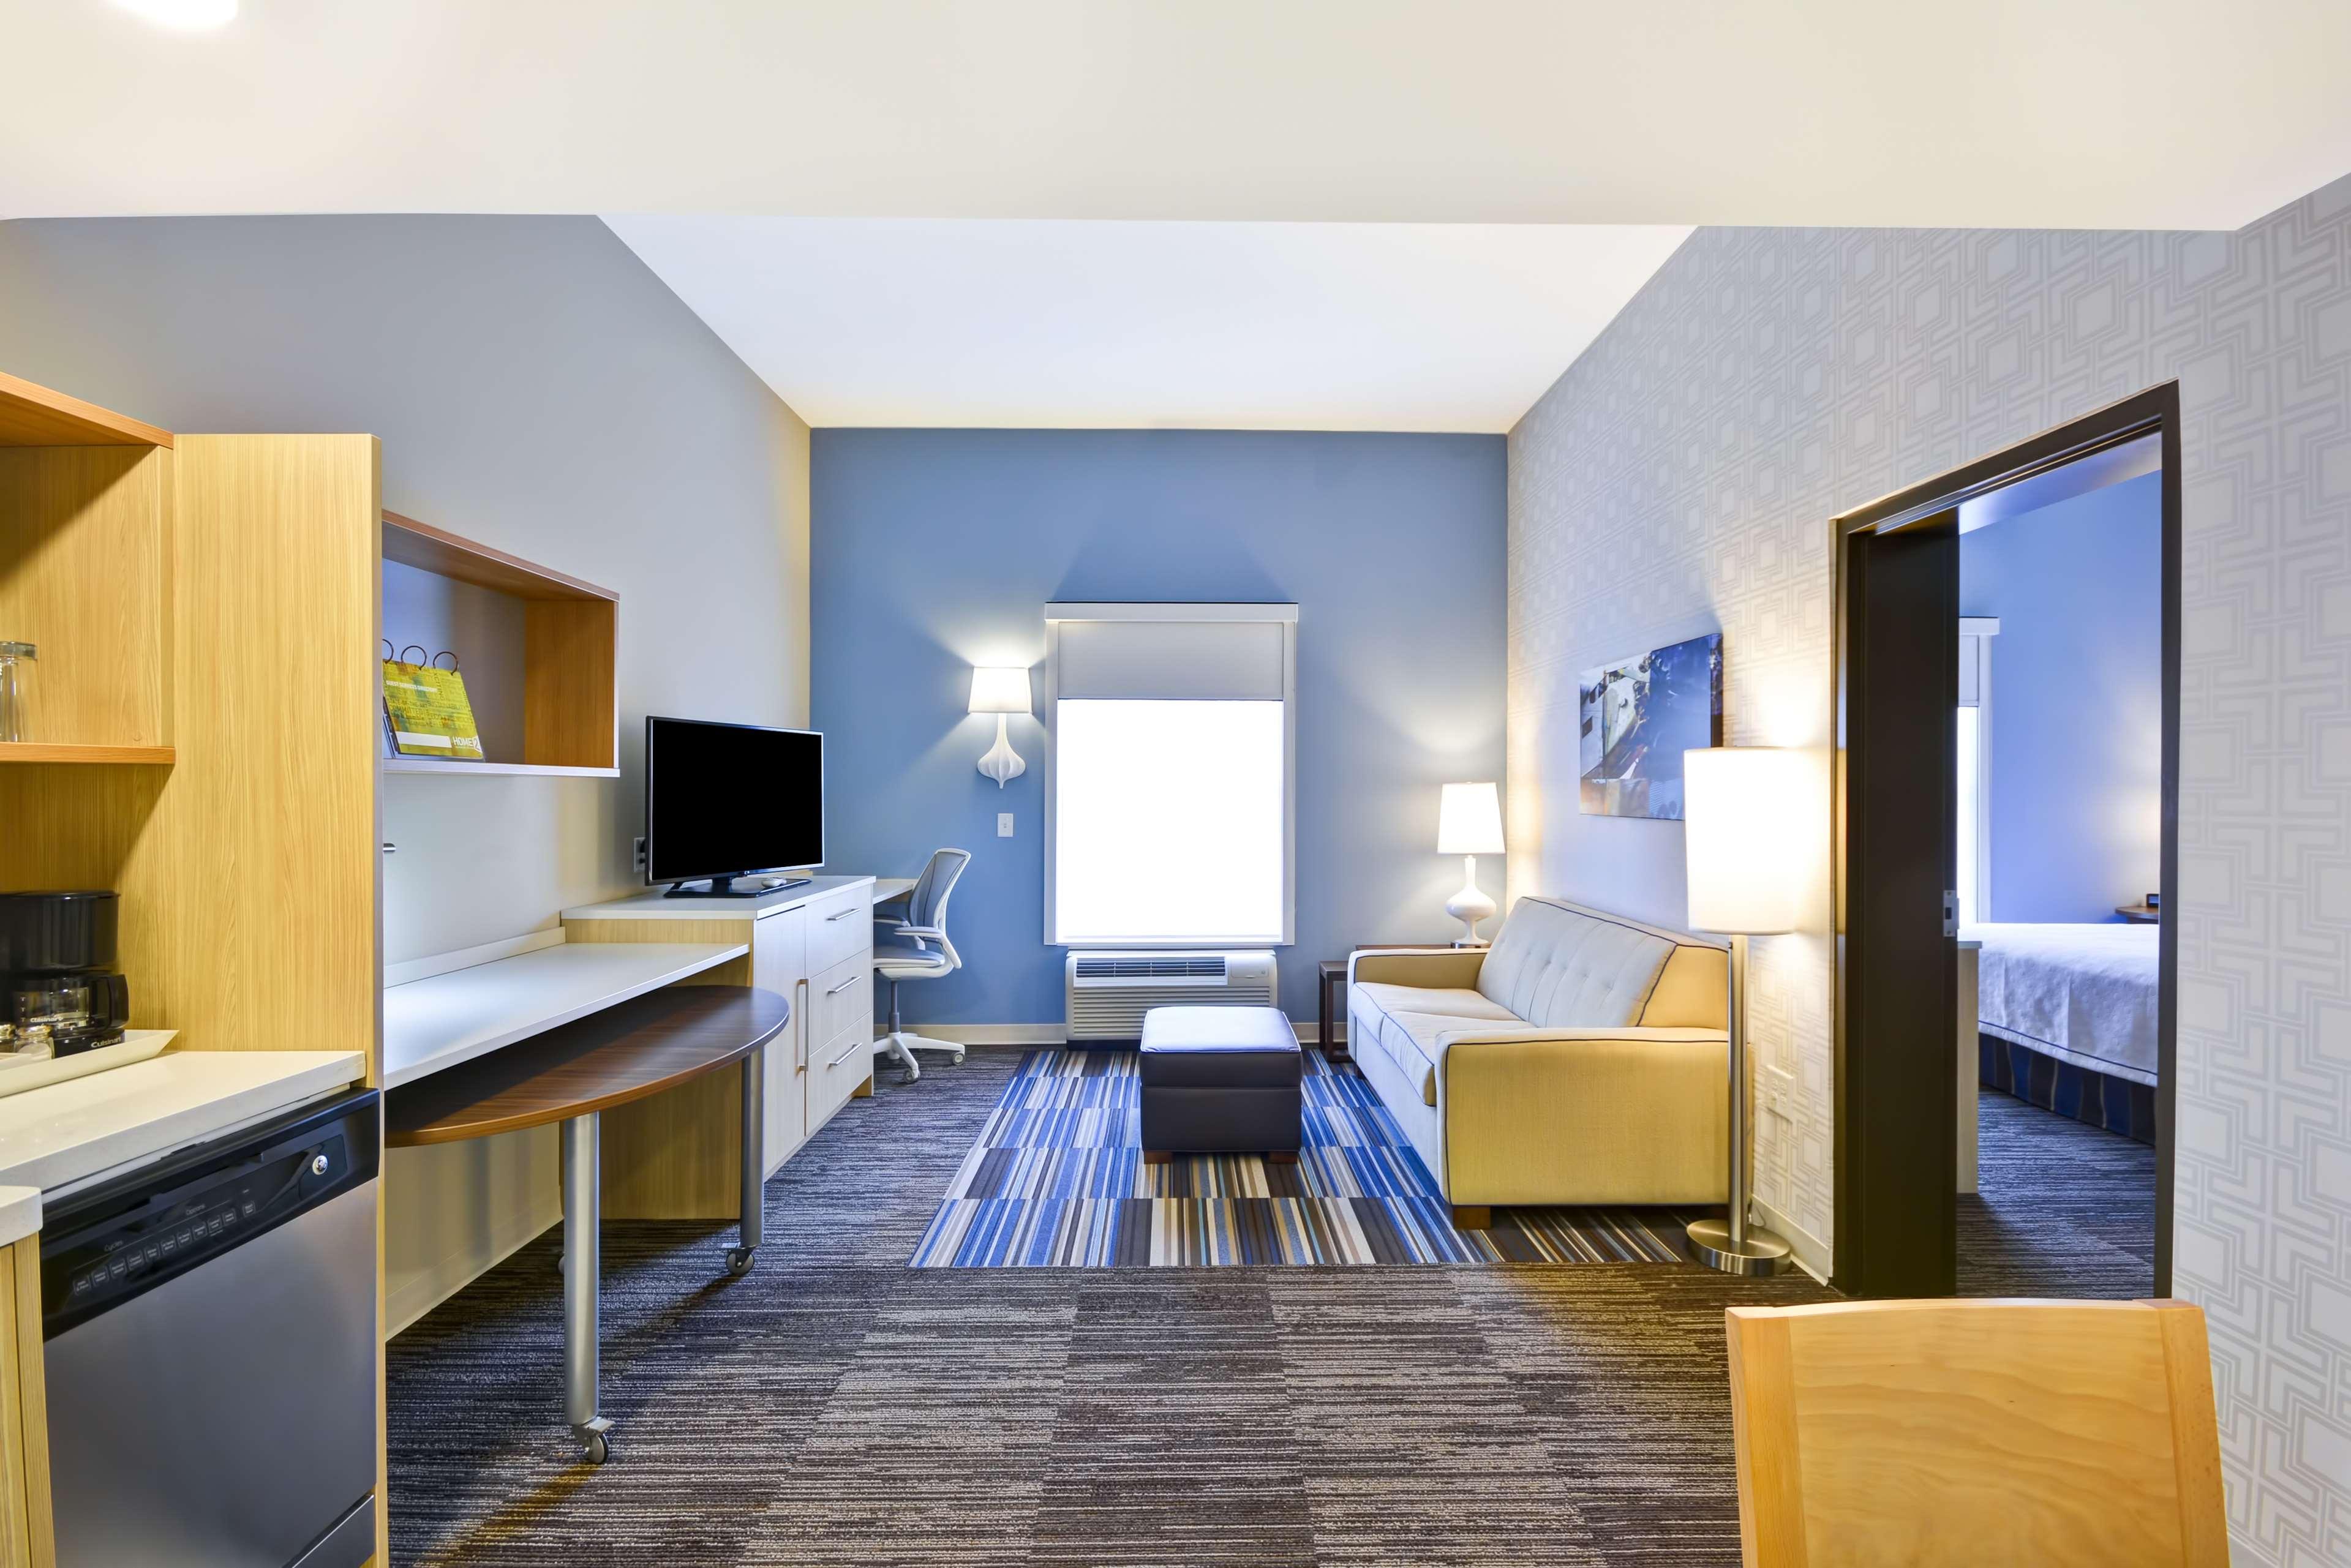 Home2 Suites by Hilton  St. Simons Island image 35